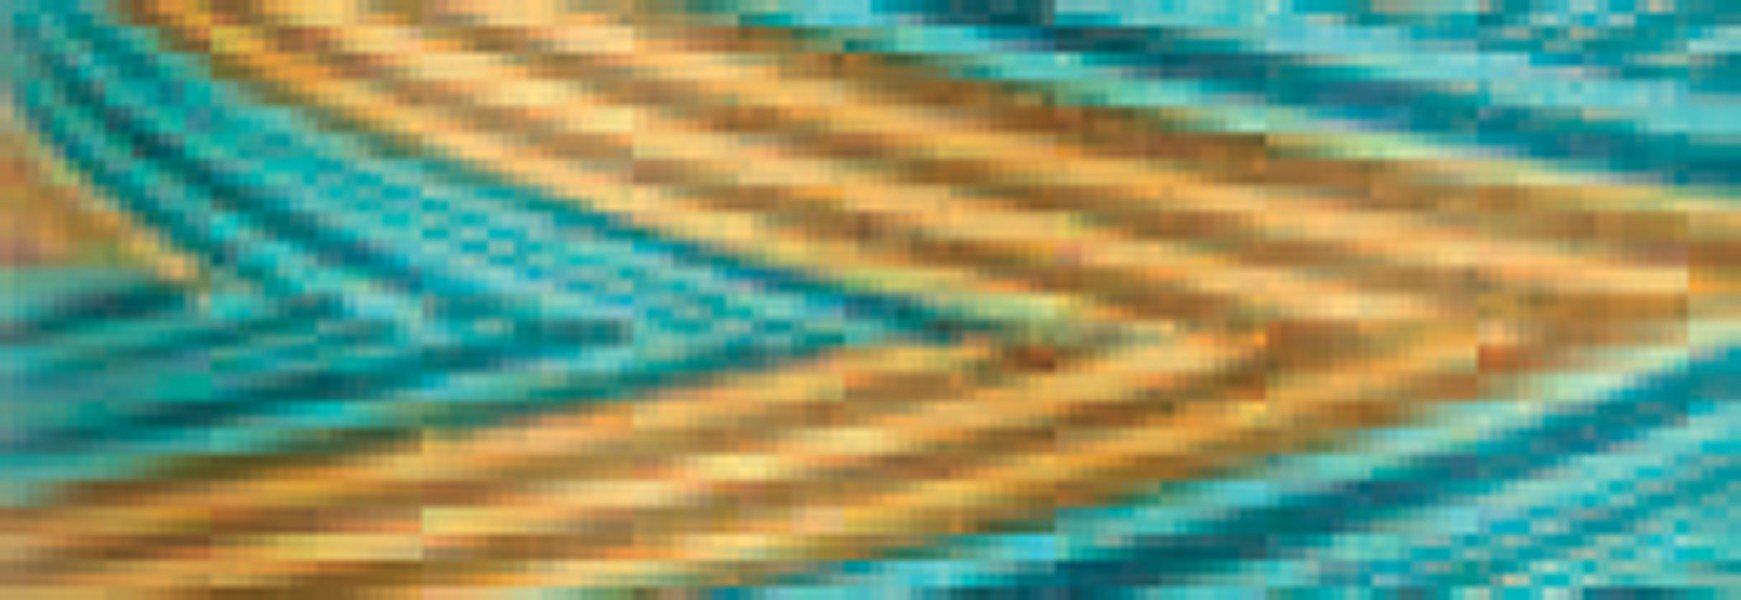 Cotton 40wt Thread 700yd - Variegated Atlantis